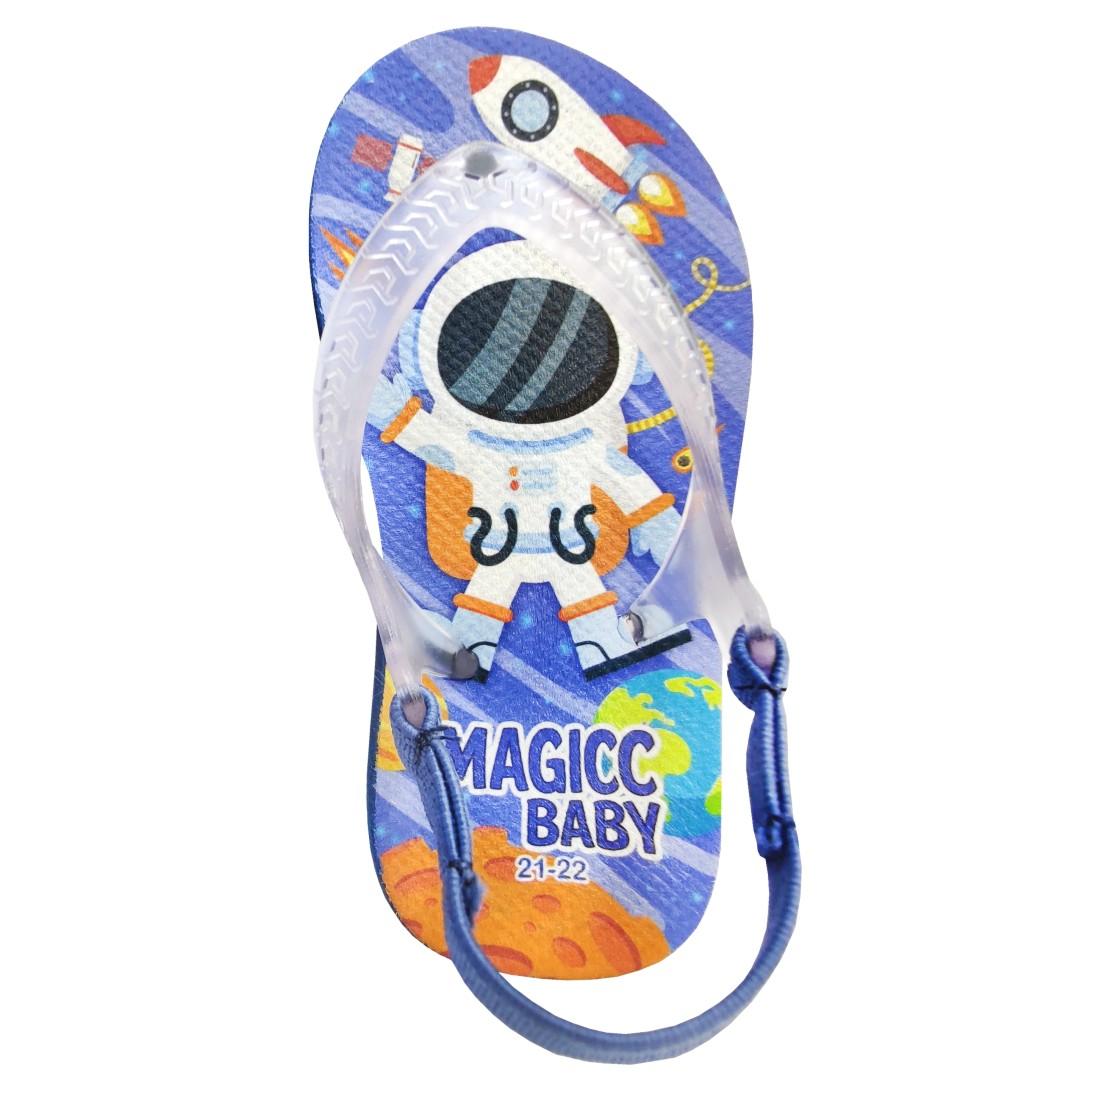 Chinelo Menino Bebê Sandália Space Astronauta Magicc Baby